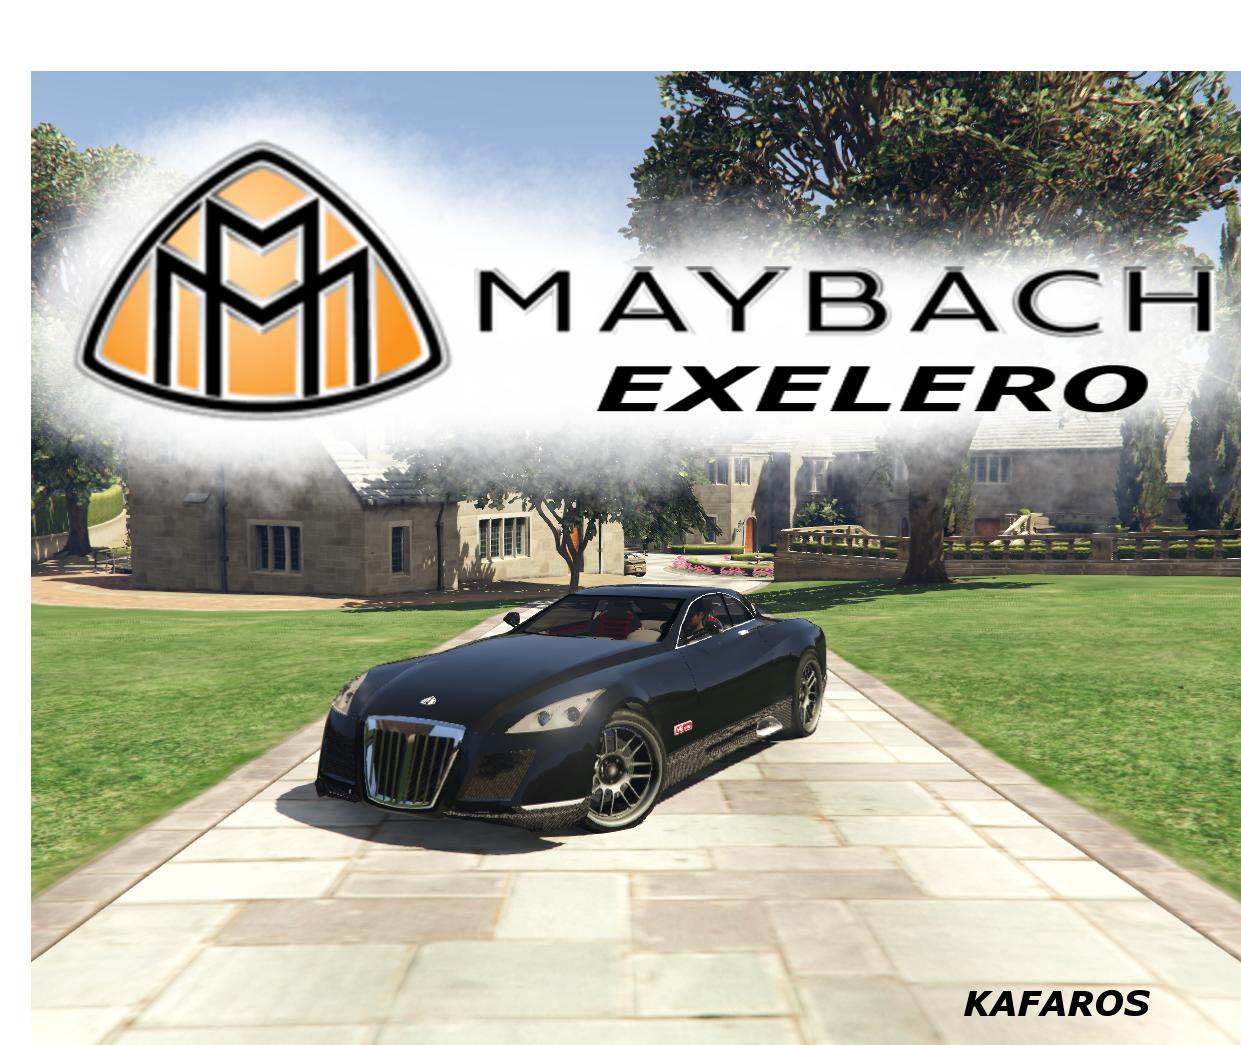 Gta 4 Vehicles Img For Backup Mod: Maybach Exelero